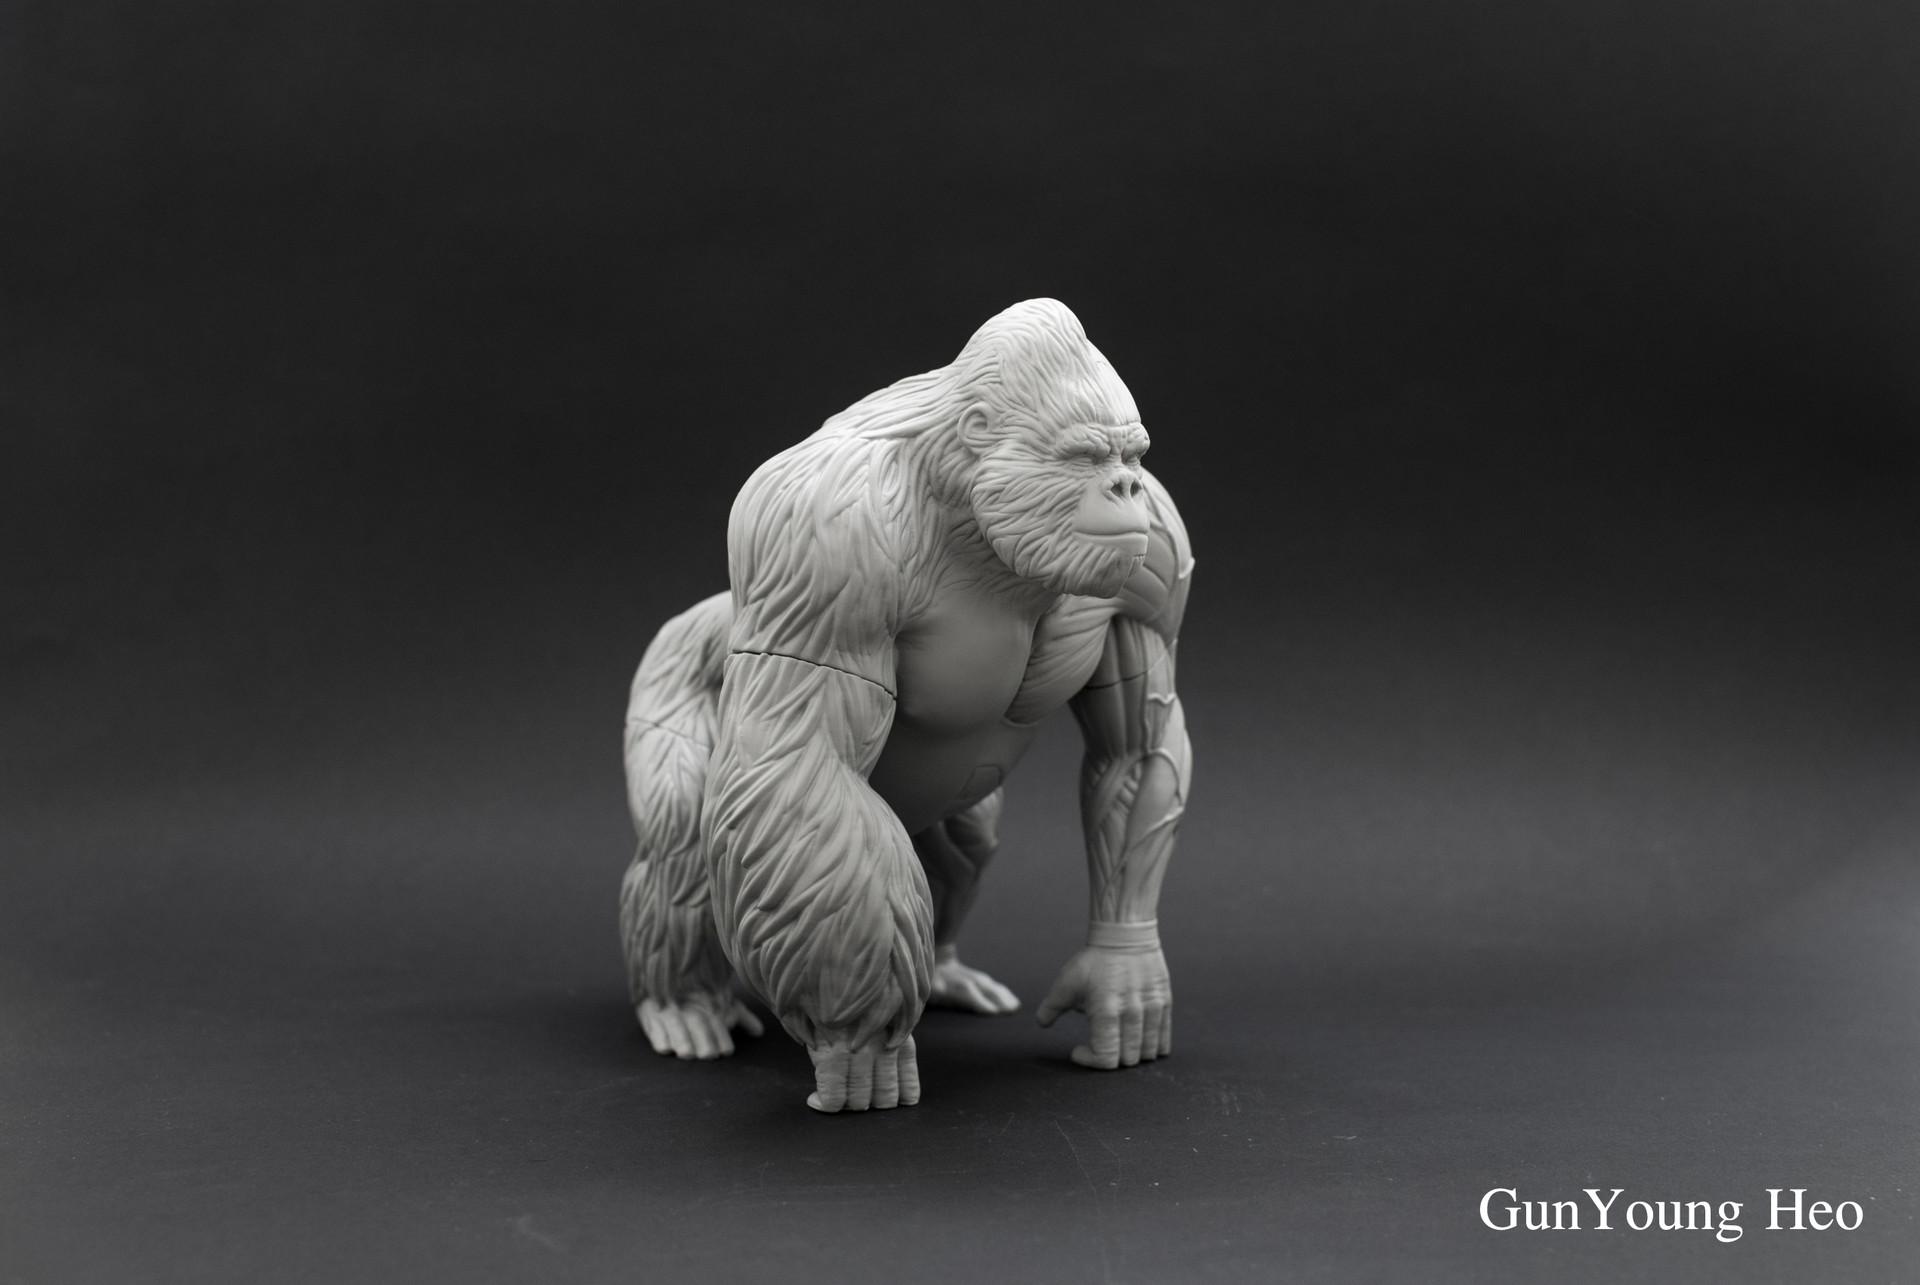 kunyoung heo - Gorilla Anatomy & 3D PRINT object